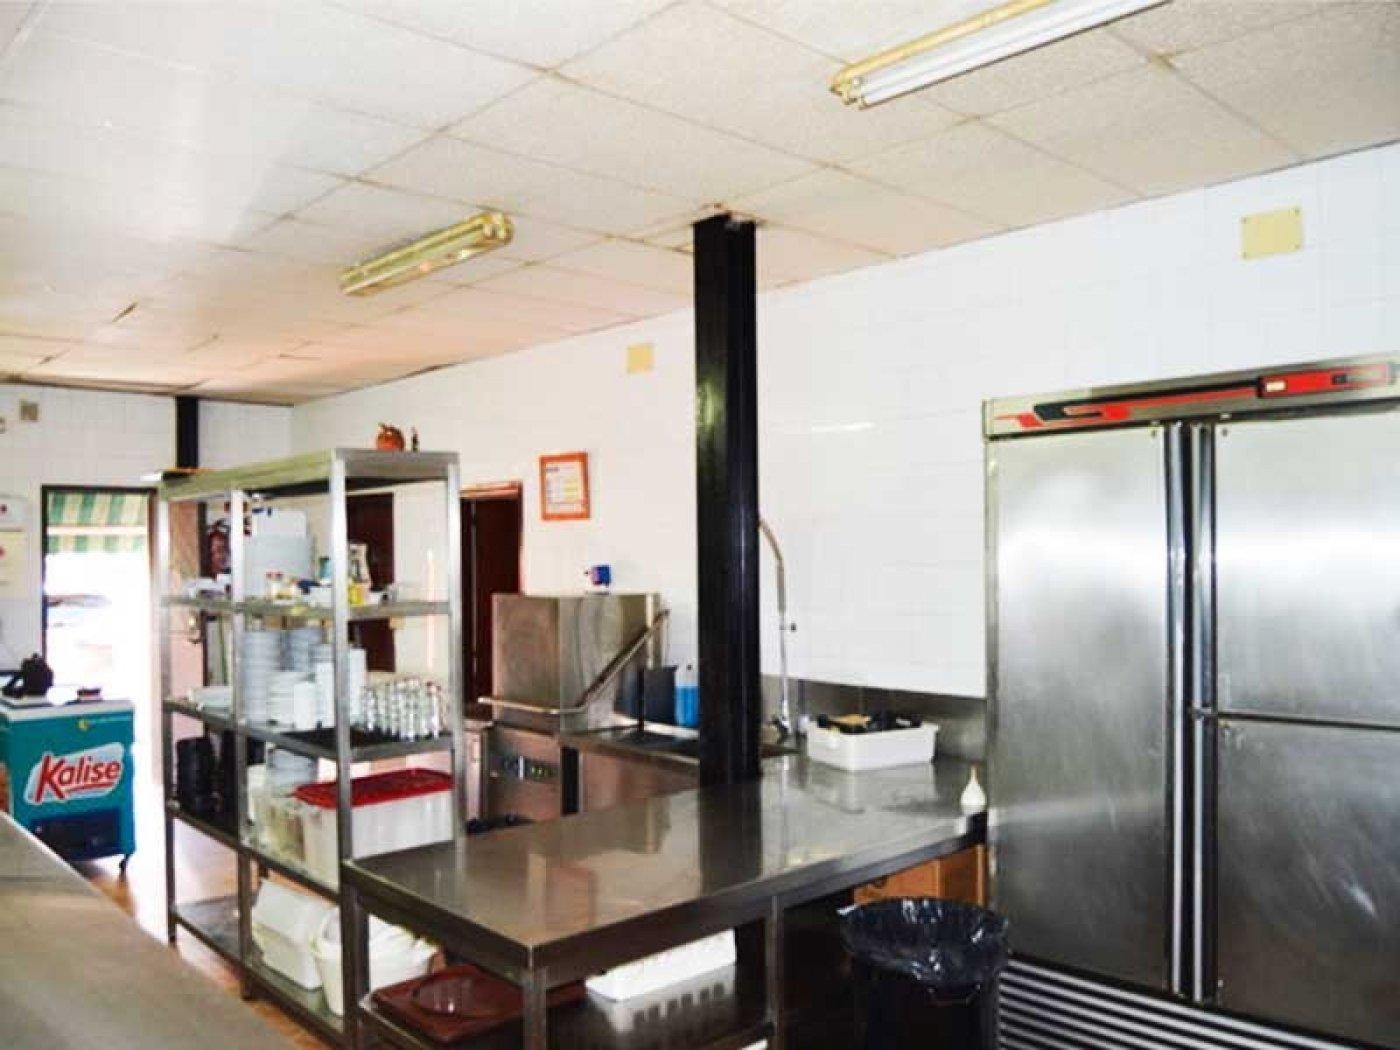 Nave restaurante en polígono cerca de sant sadurní d´anoia - imagenInmueble30